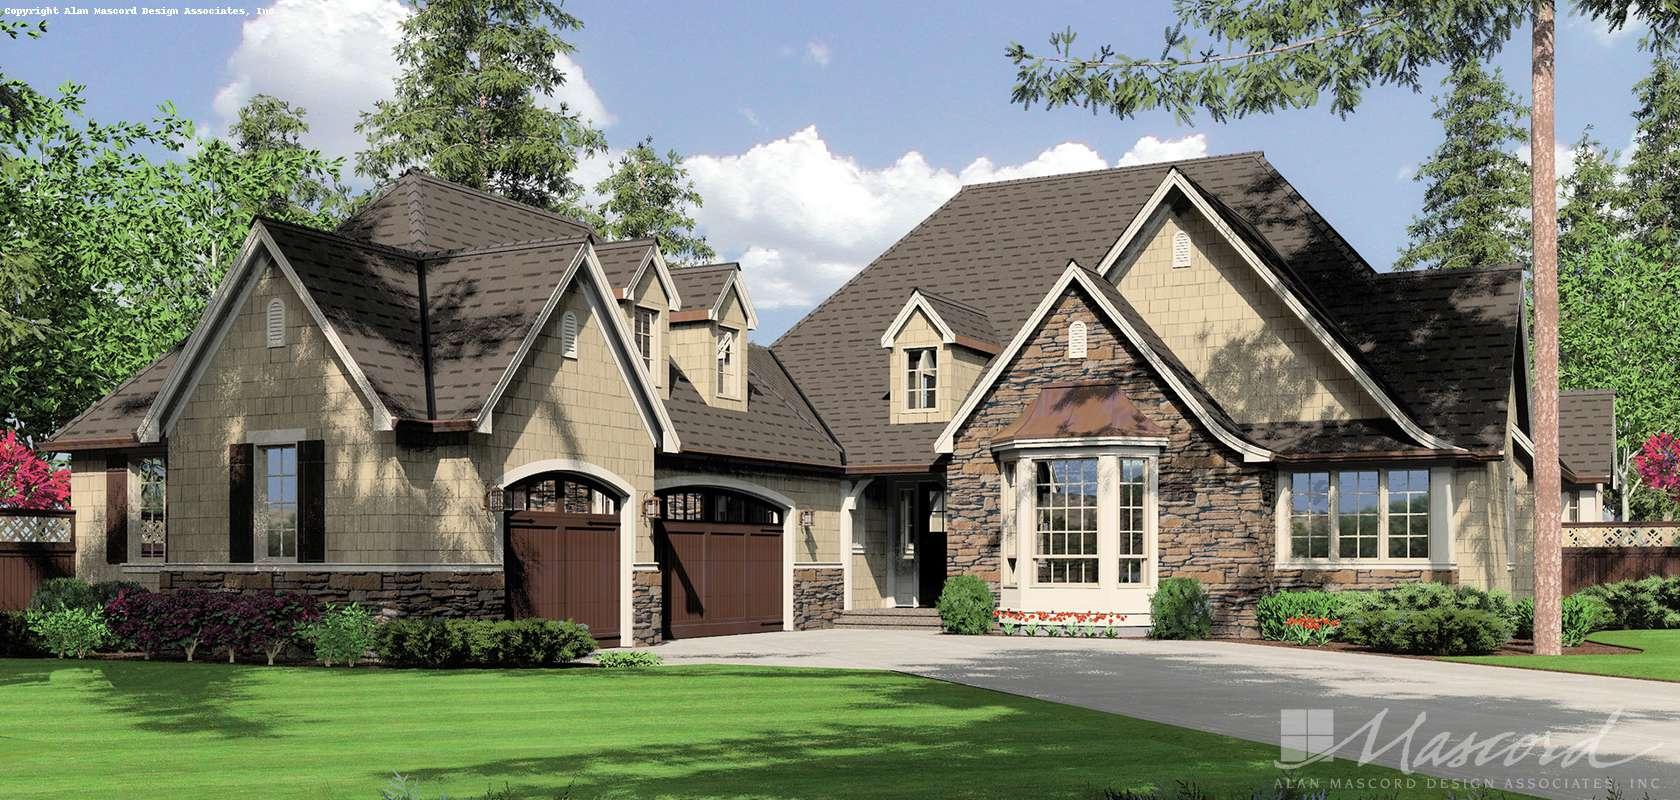 Mascord House Plan 1234: The Alberg